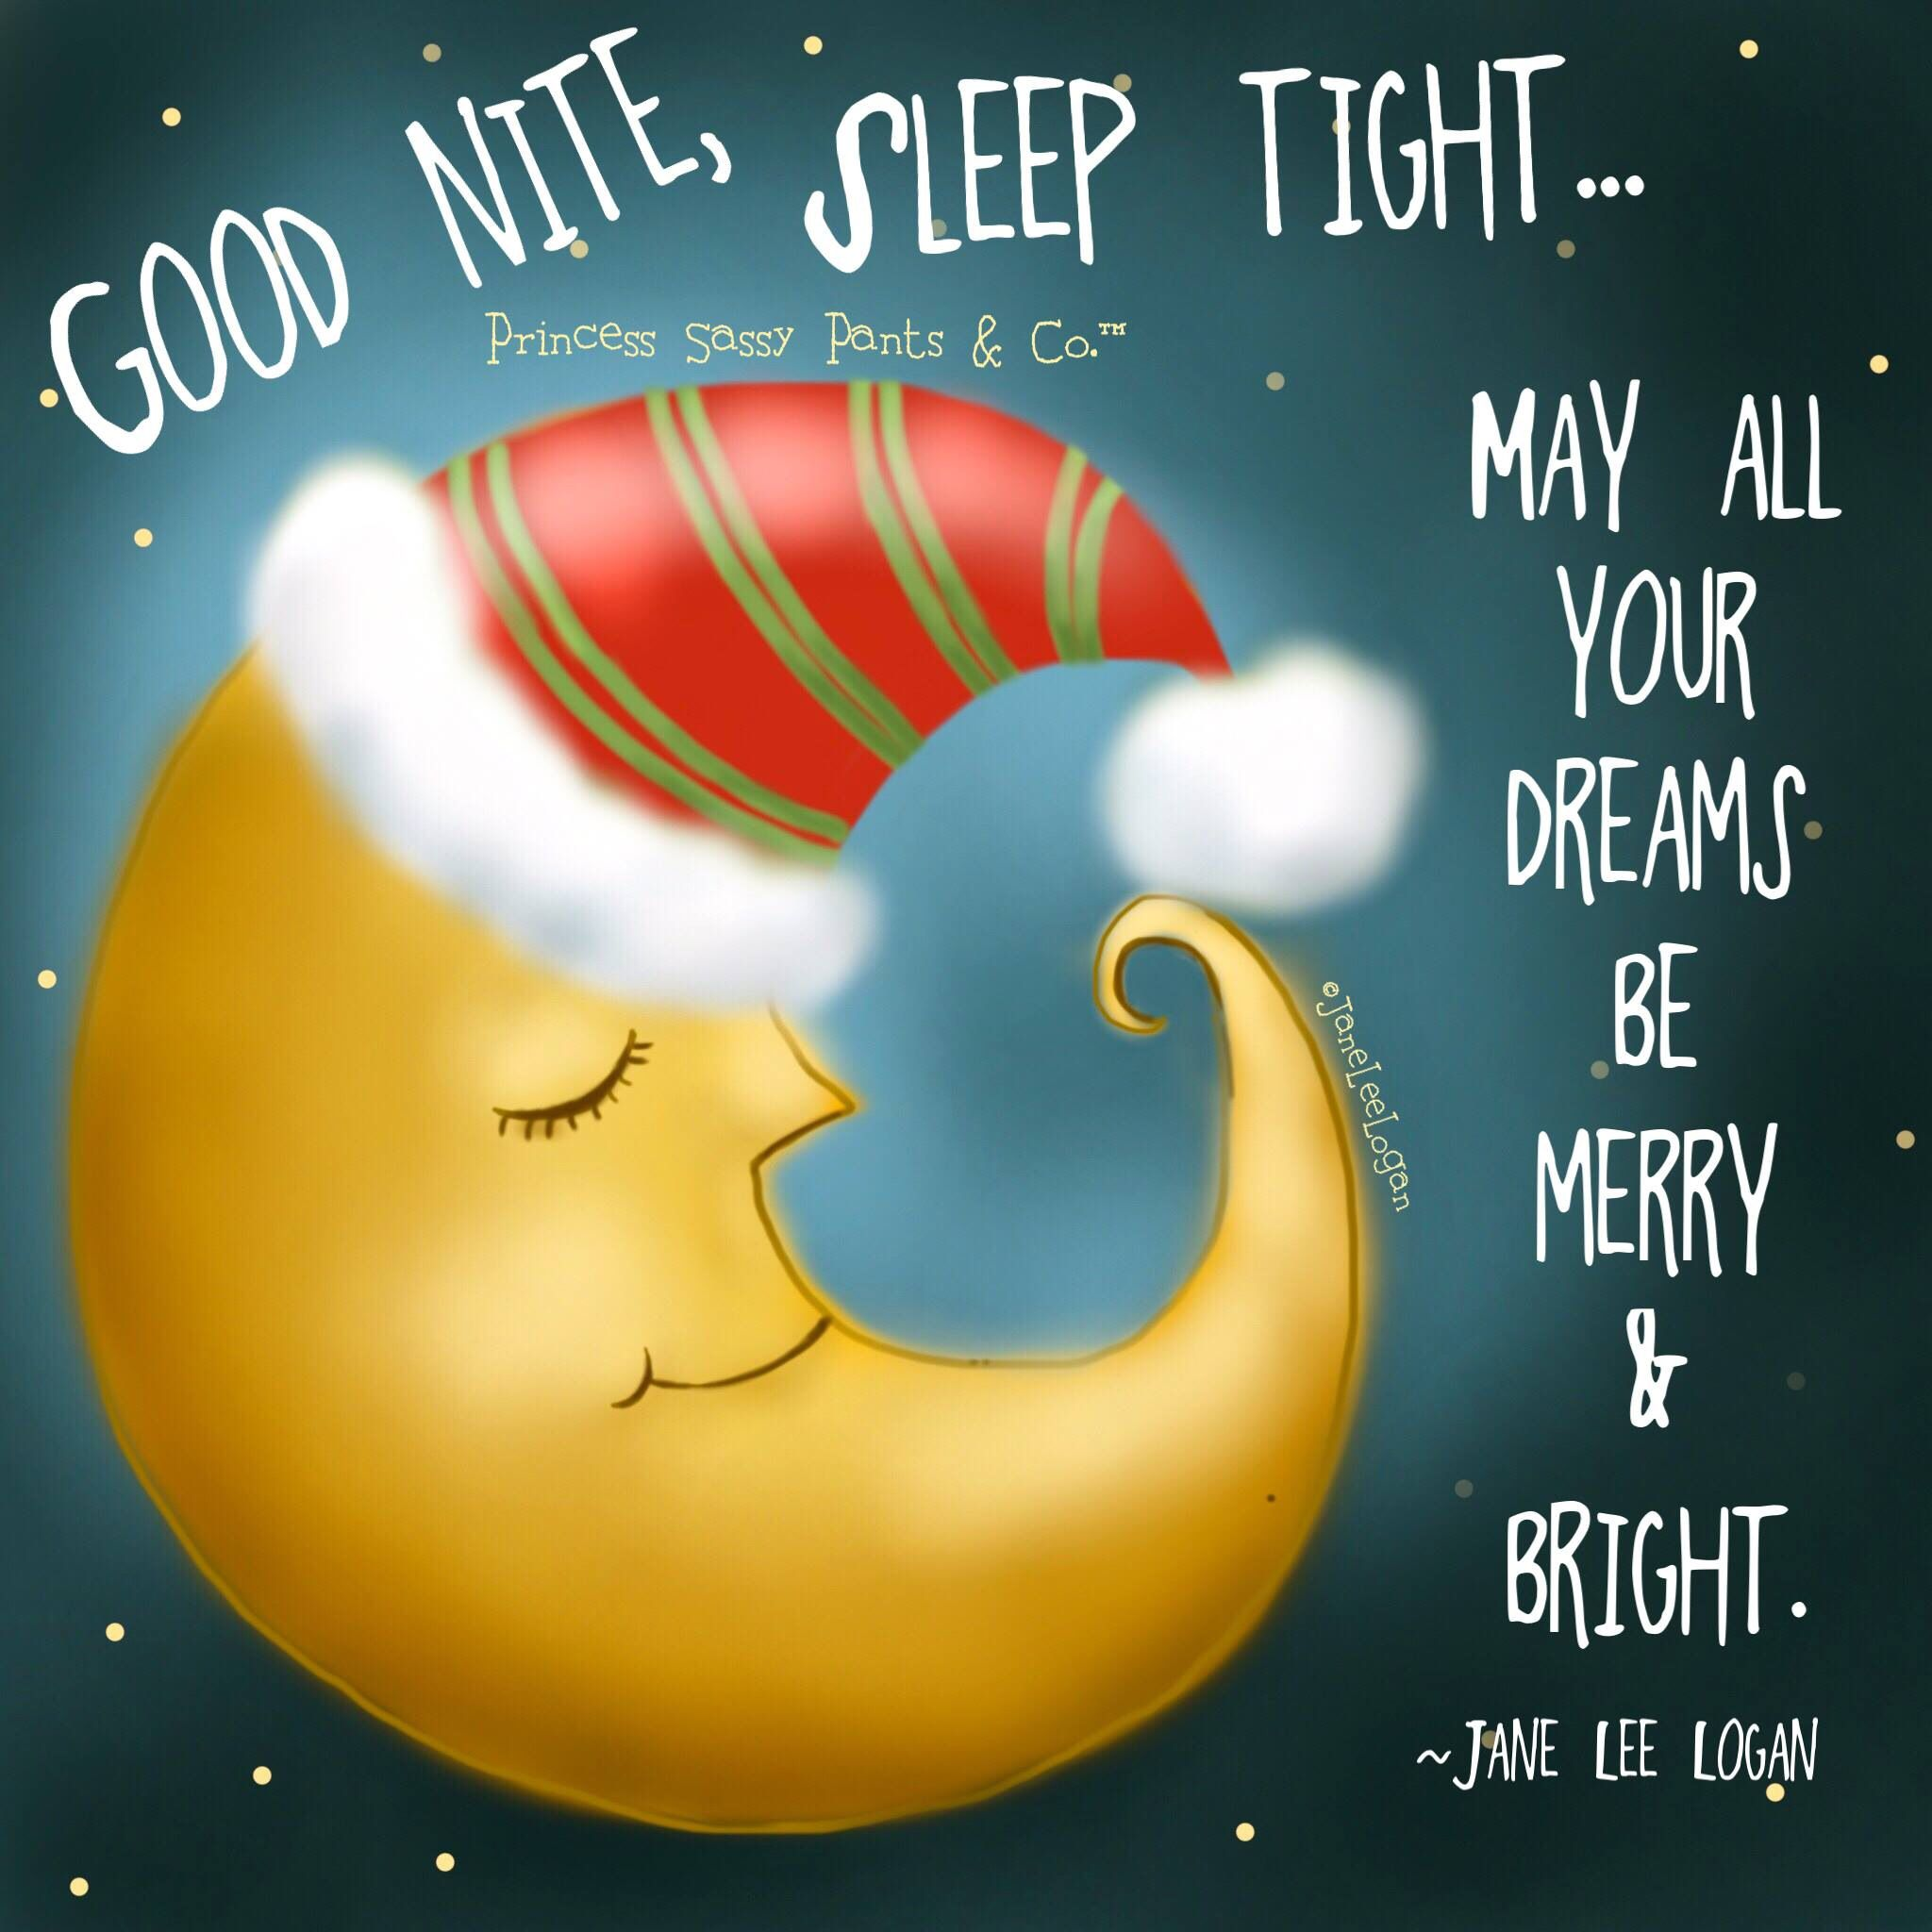 Good nite, sleep tight | Sassy pants, Good night friends